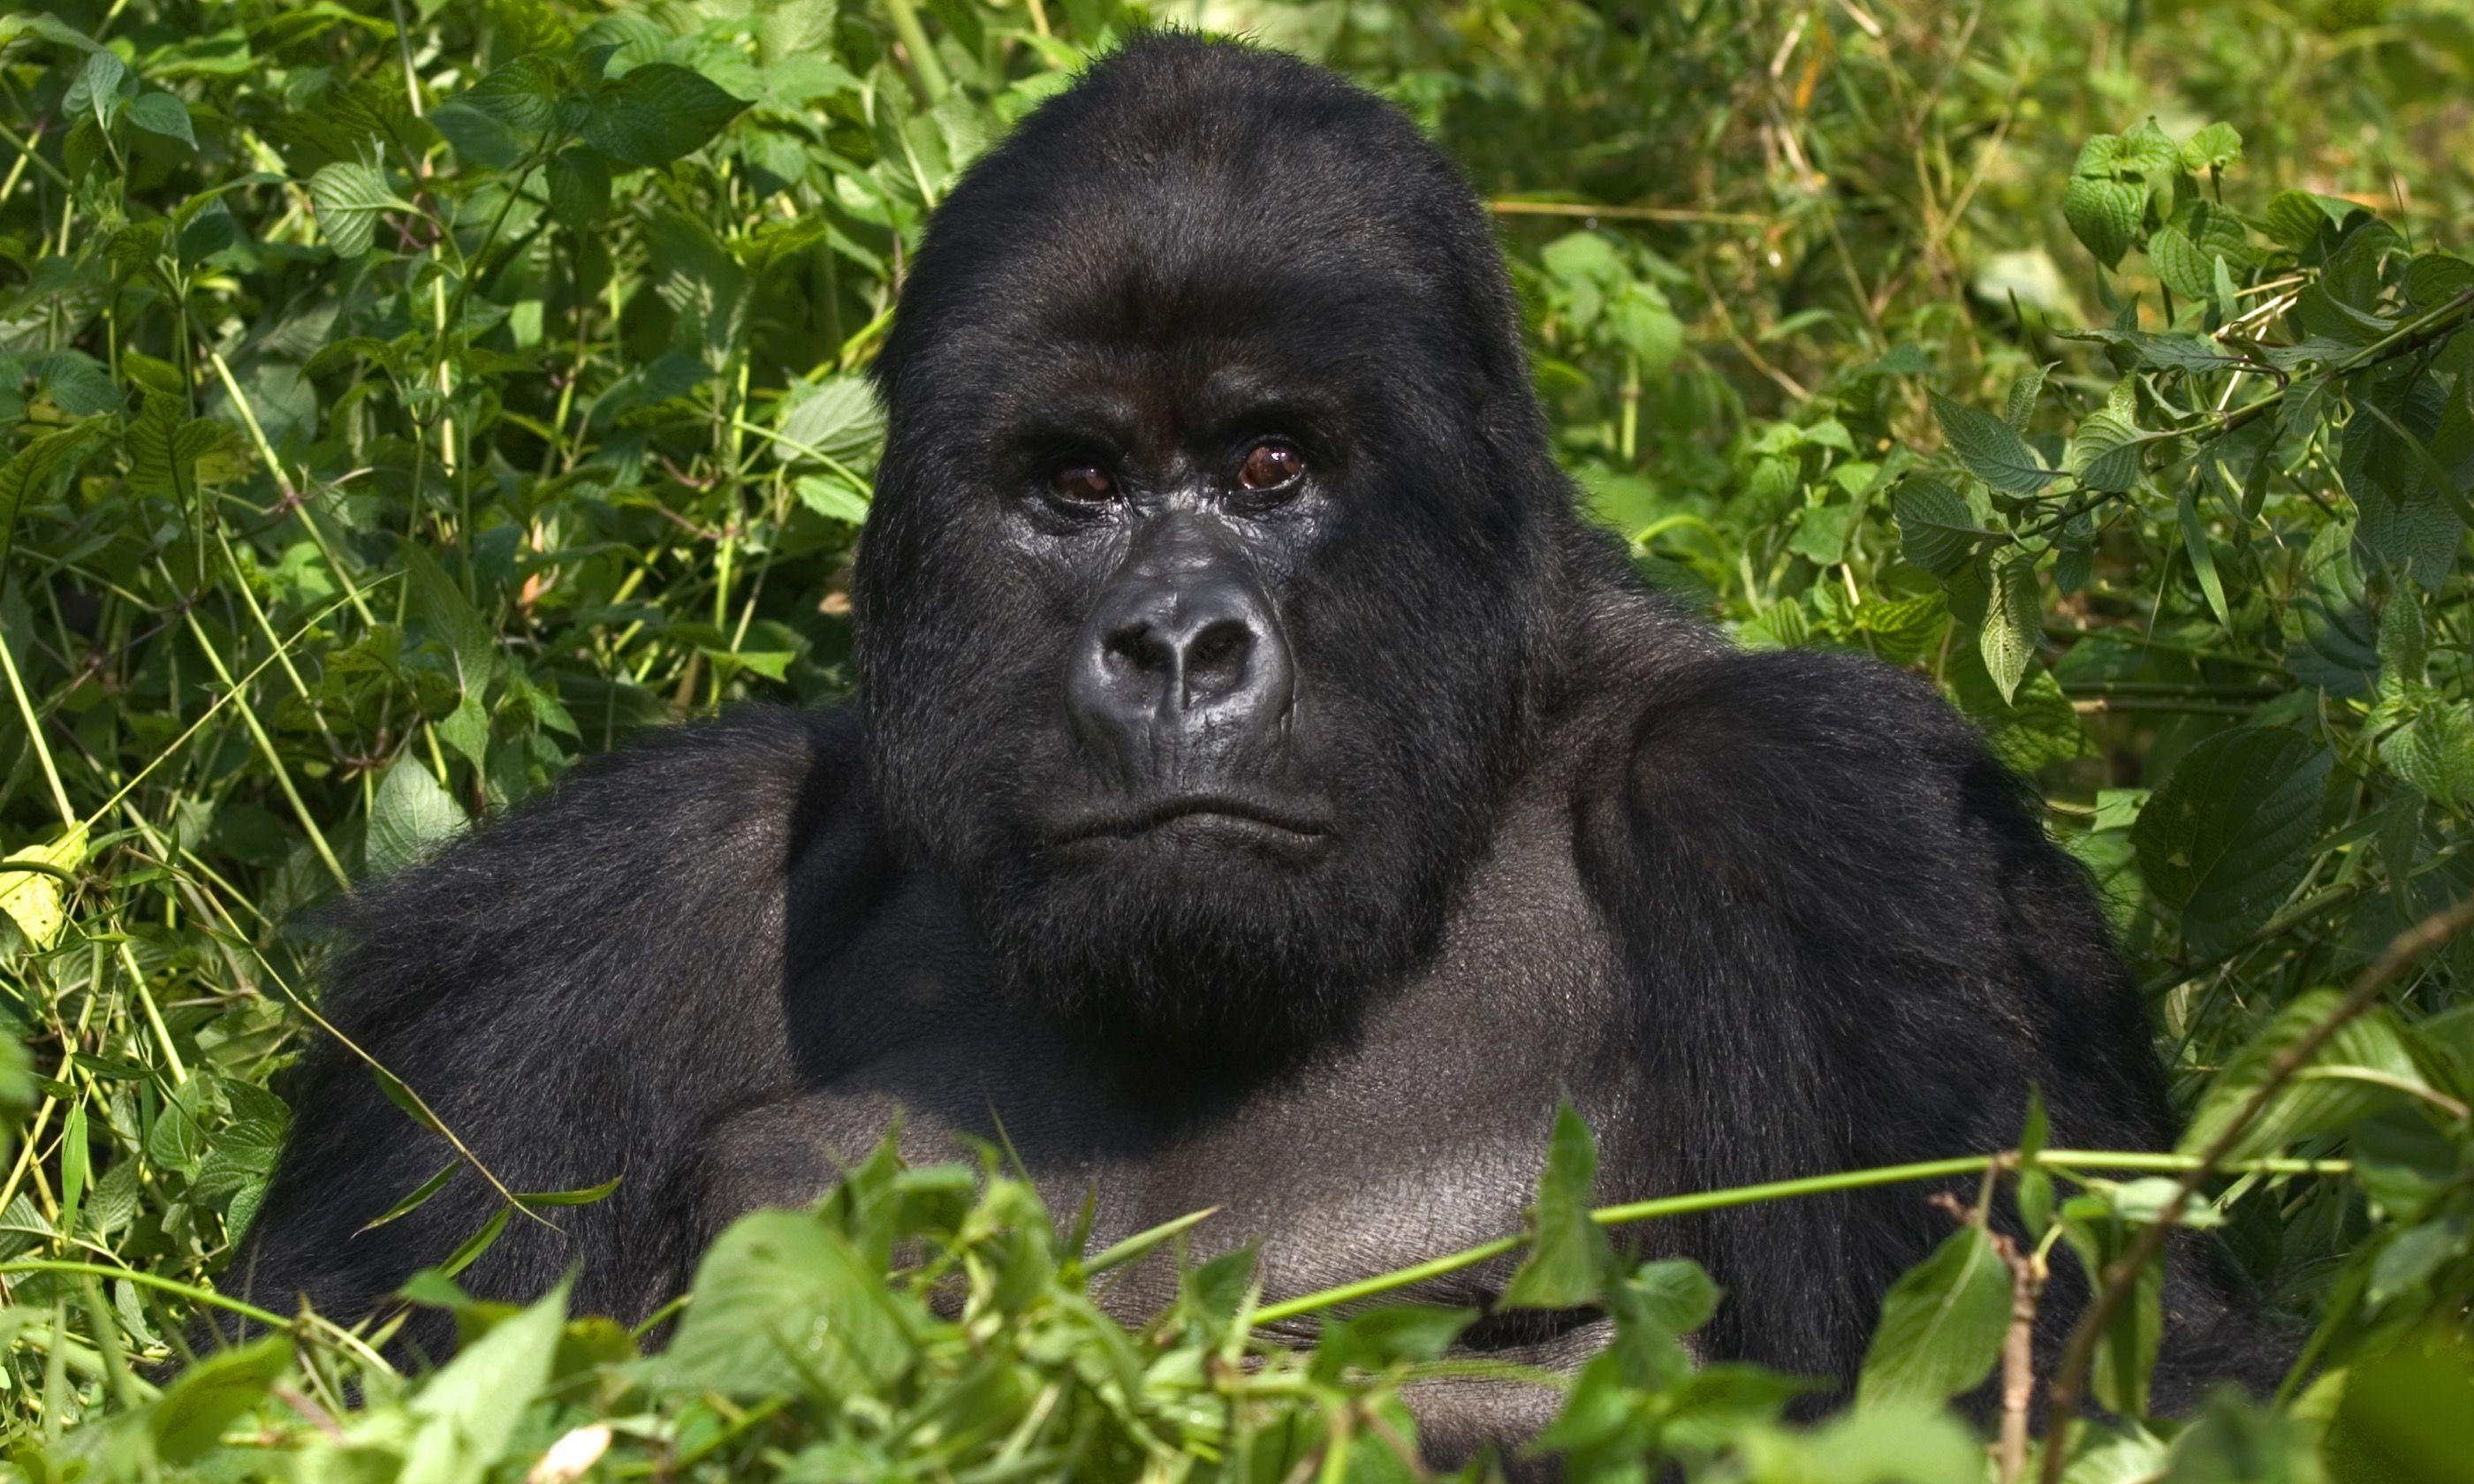 A mountain gorilla in Rwanda (Dreamstime)